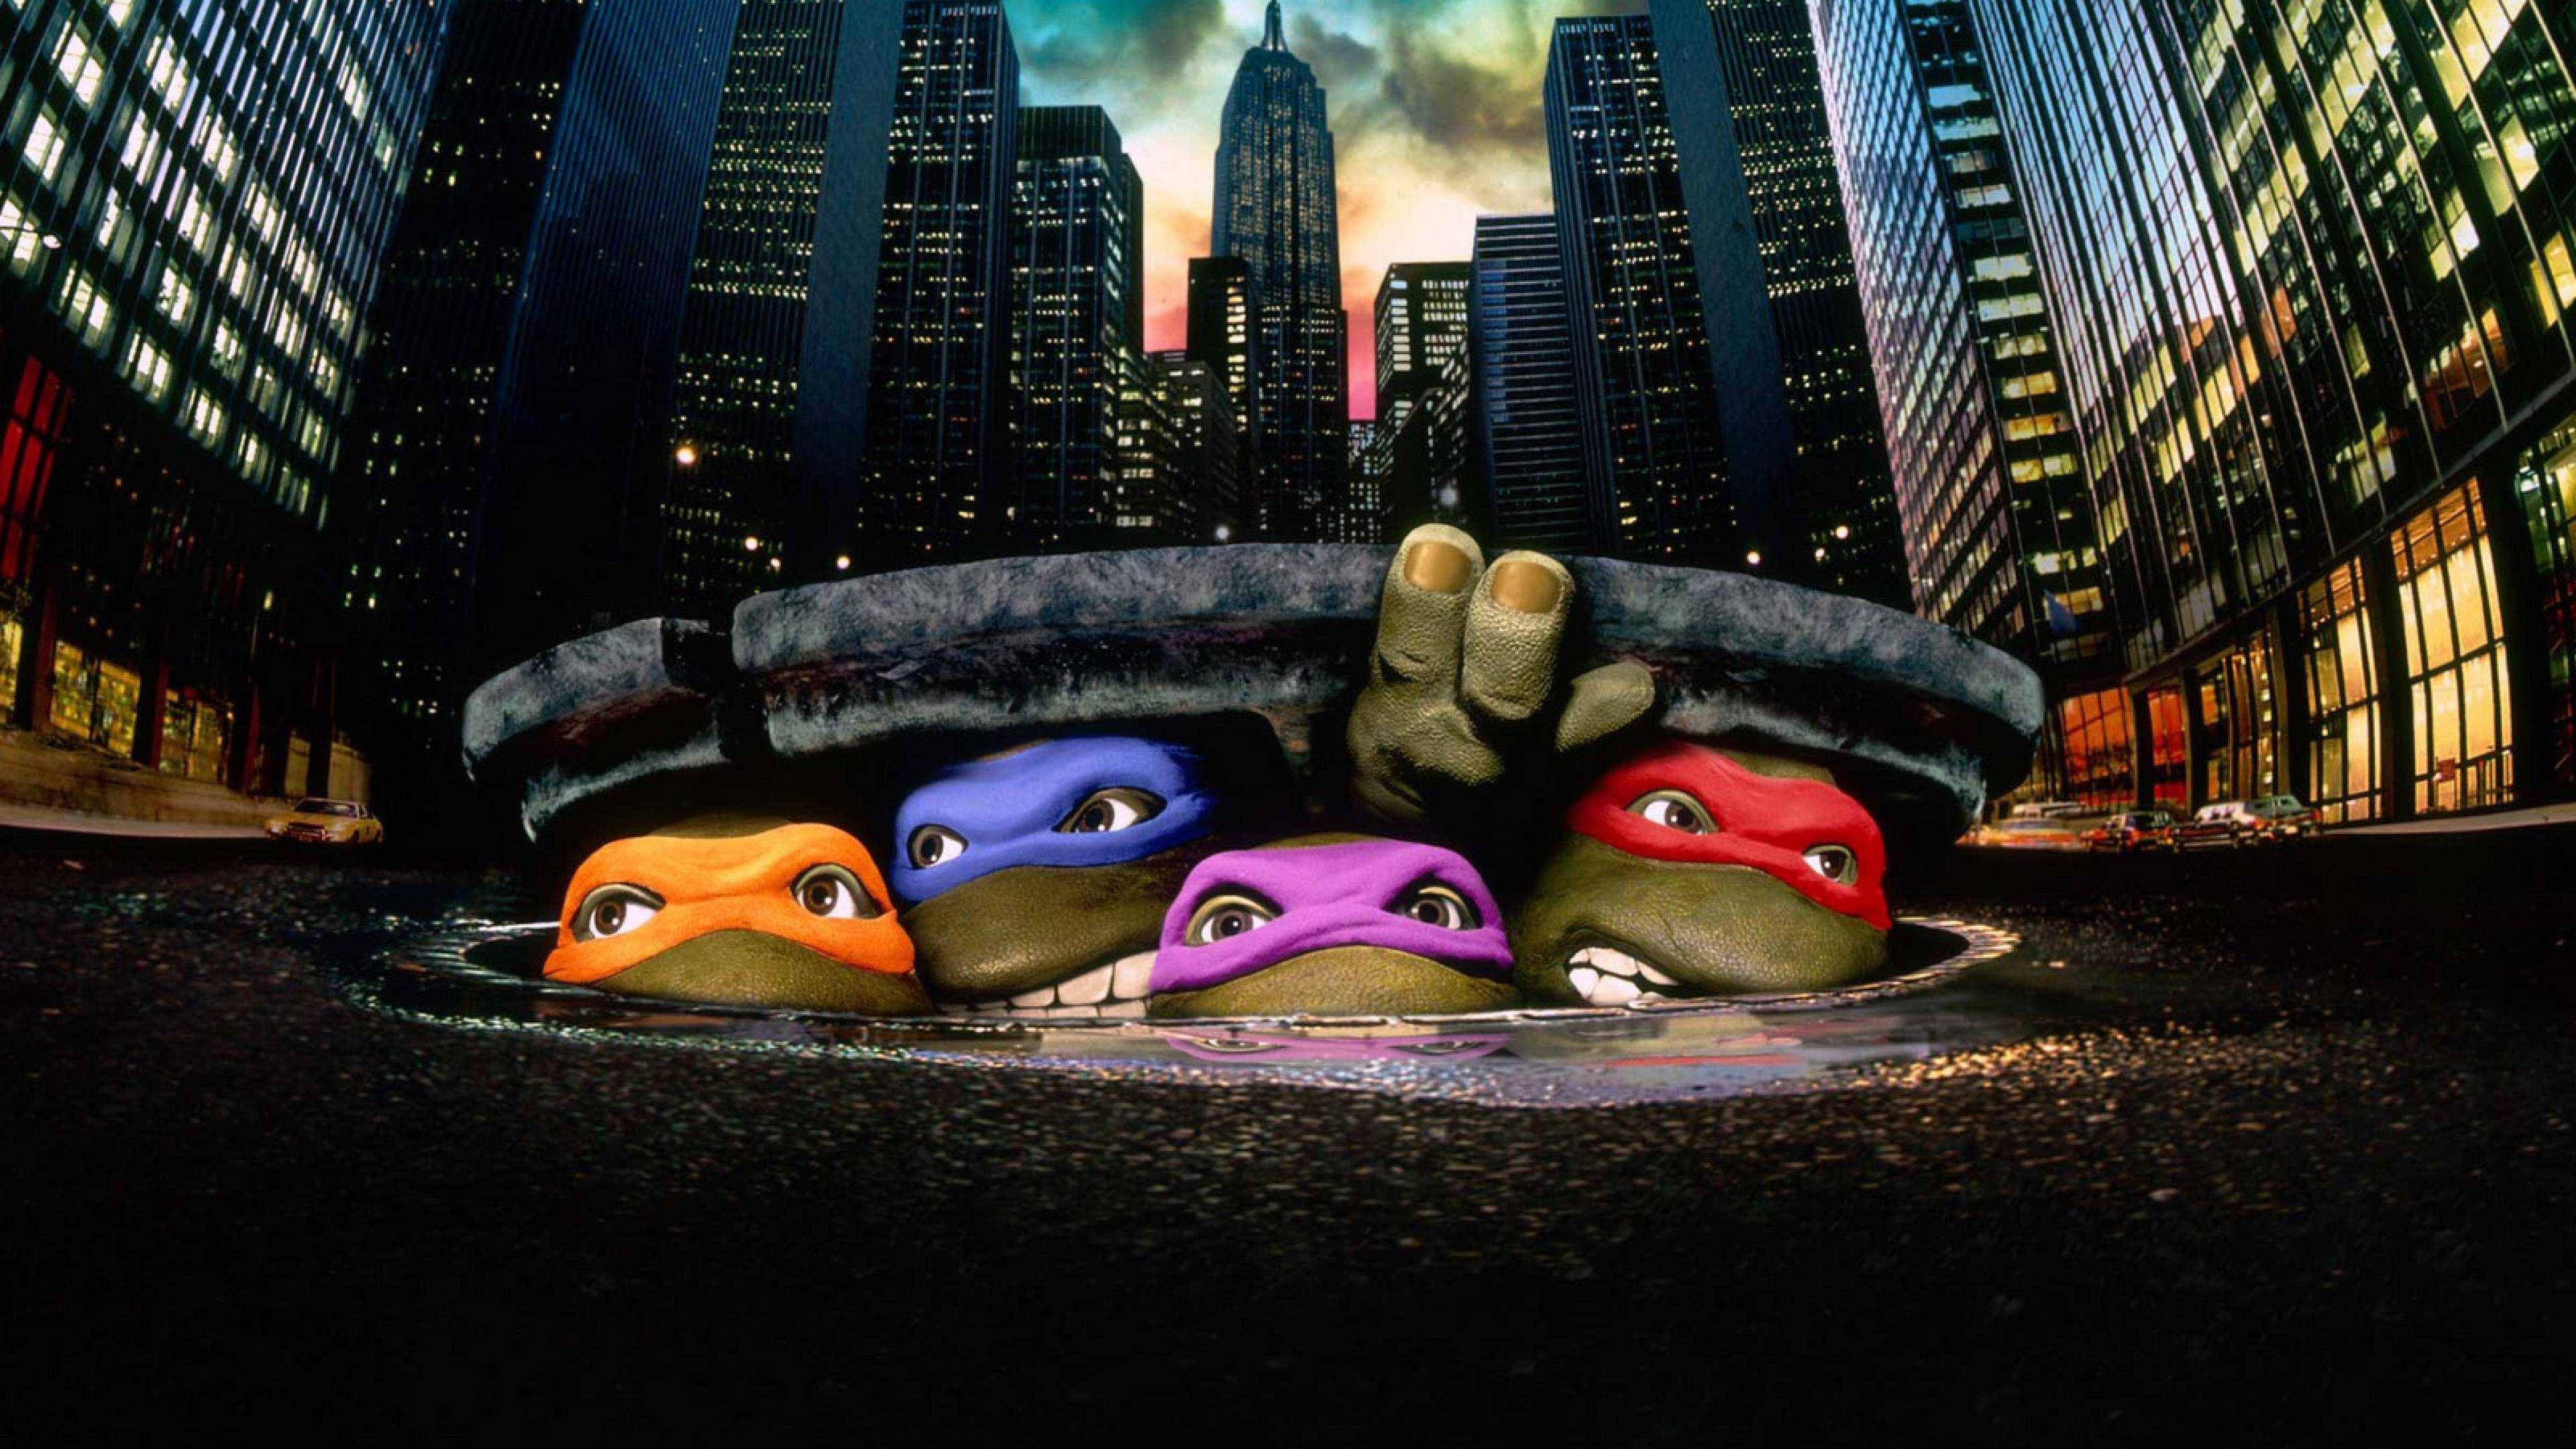 Res: 3840x2160, Teenage Mutant Ninja Turtles Wallpaper Full Hd For Mobile